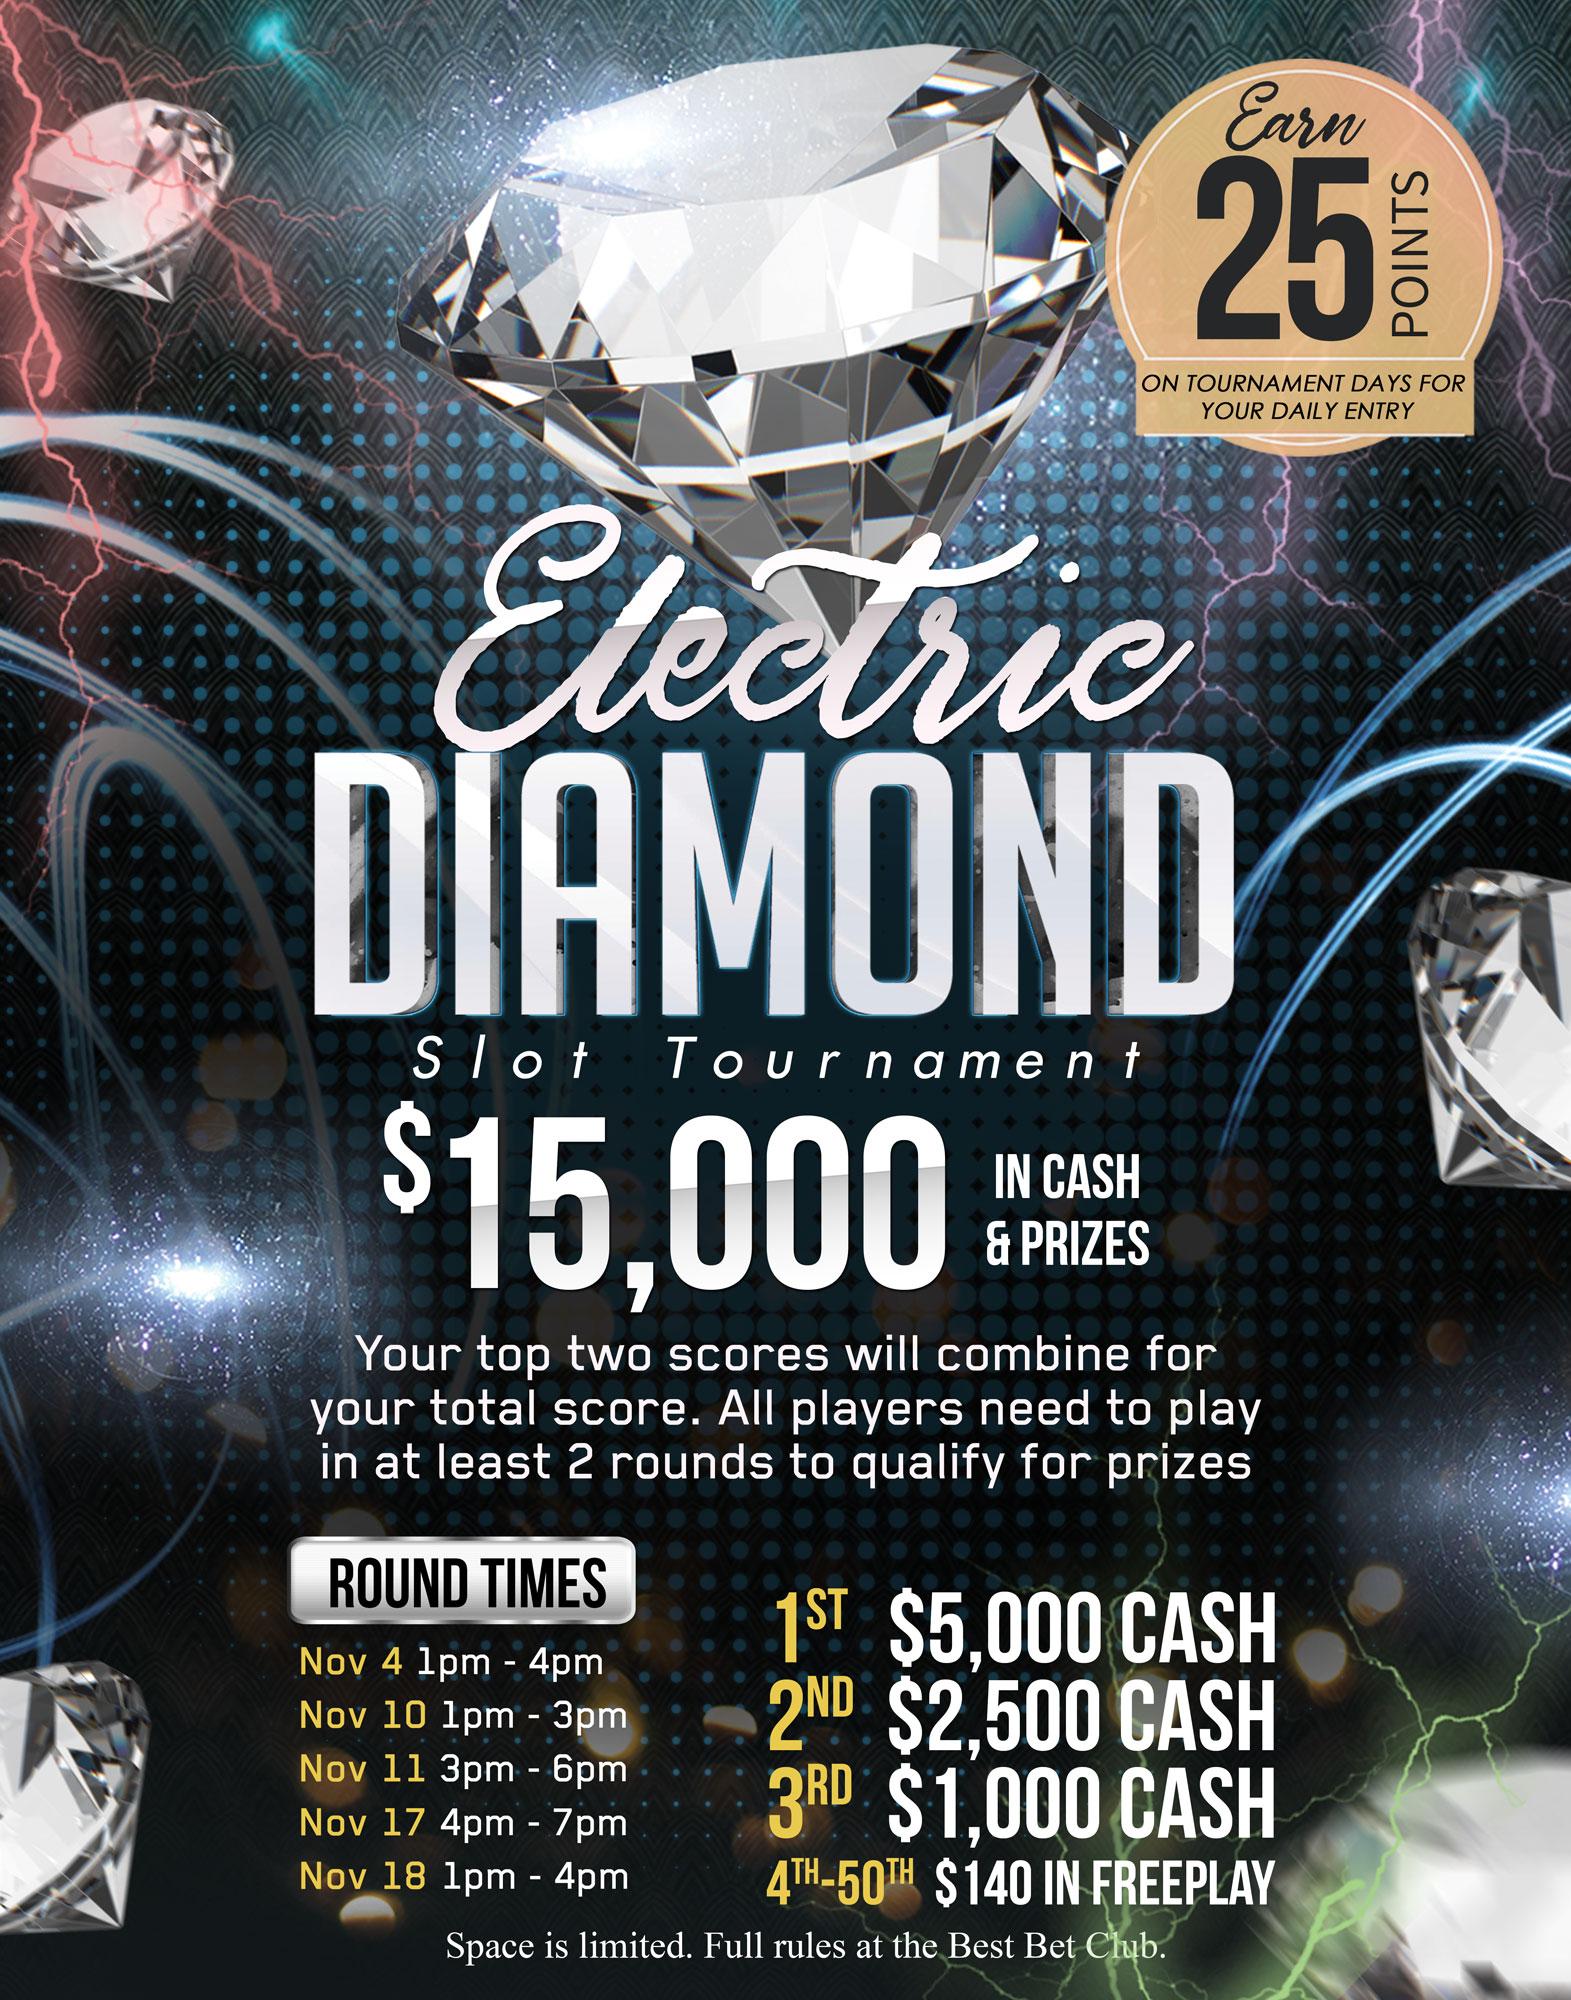 Electric Diamond Slot Tournament